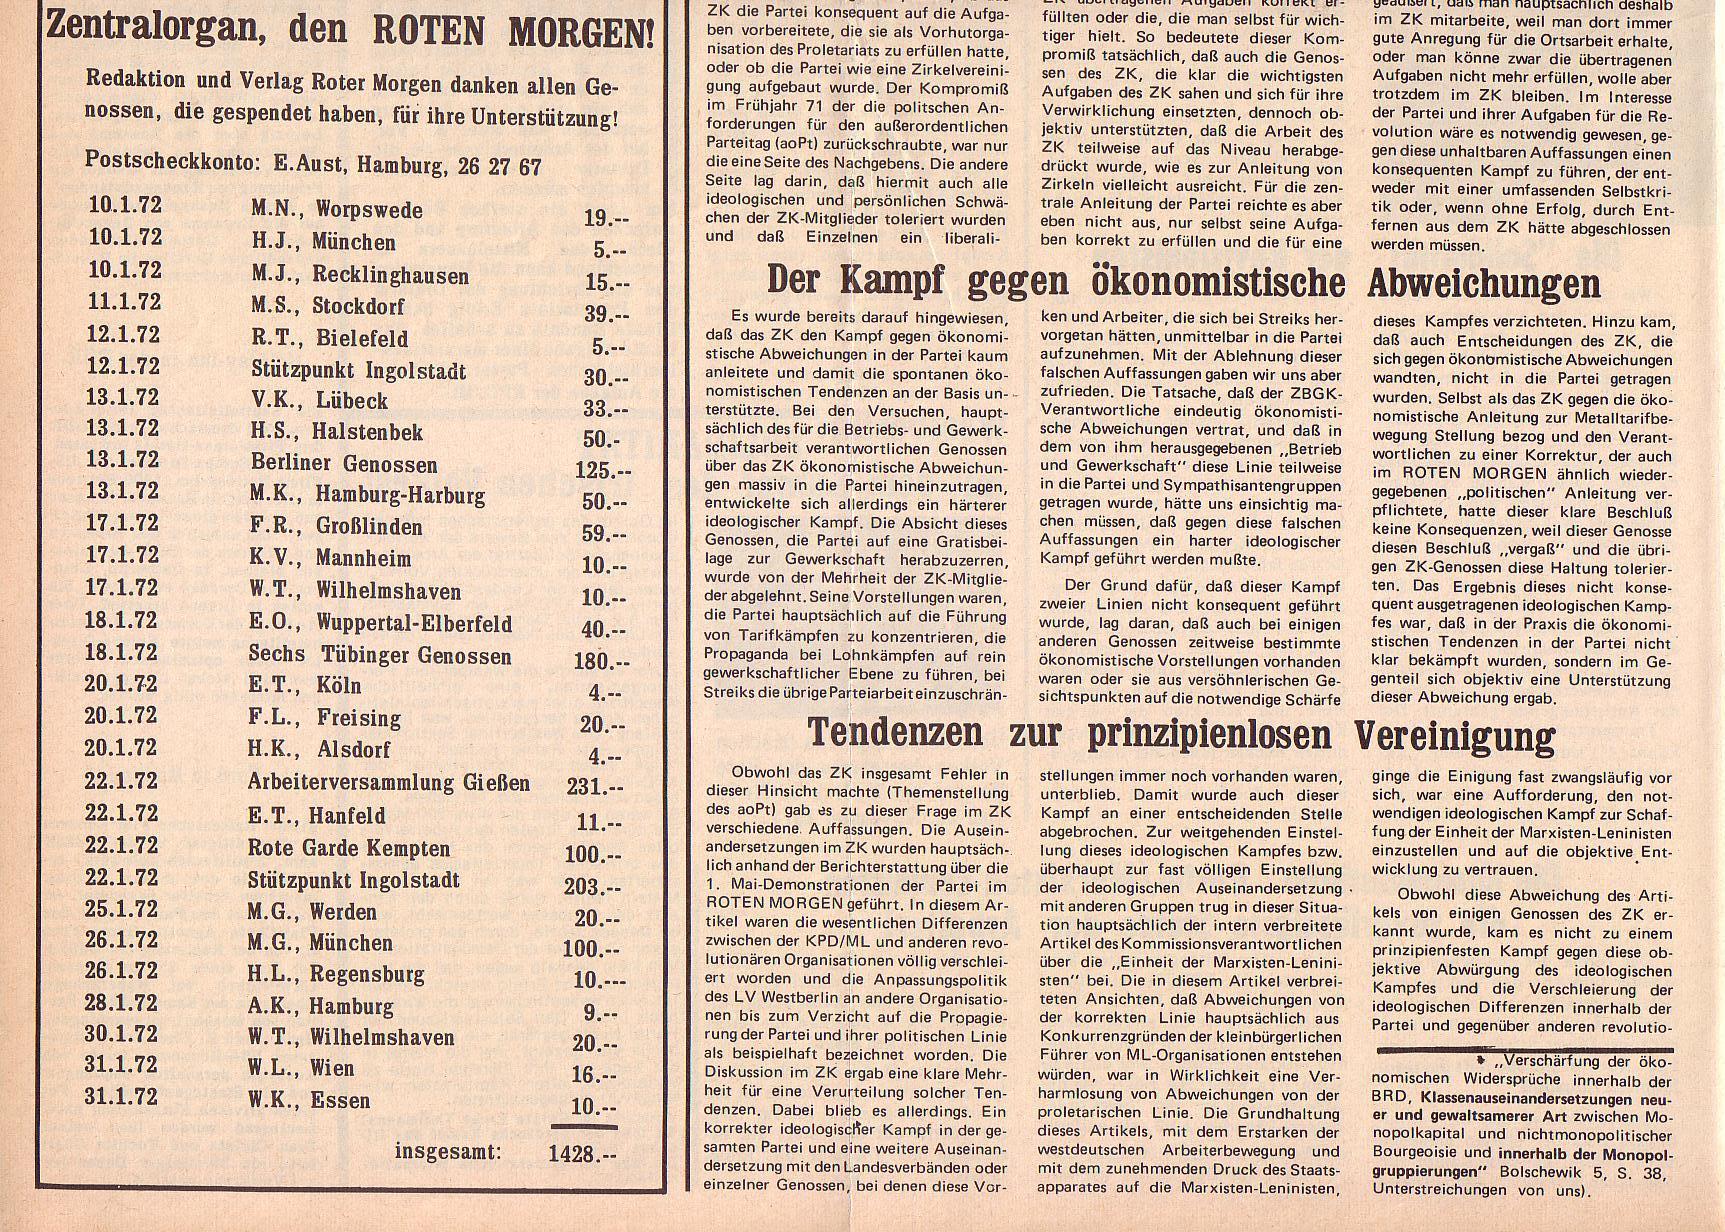 Roter Morgen, 6. Jg., 14. Februar 1972, Nr. 4, Seite 6b